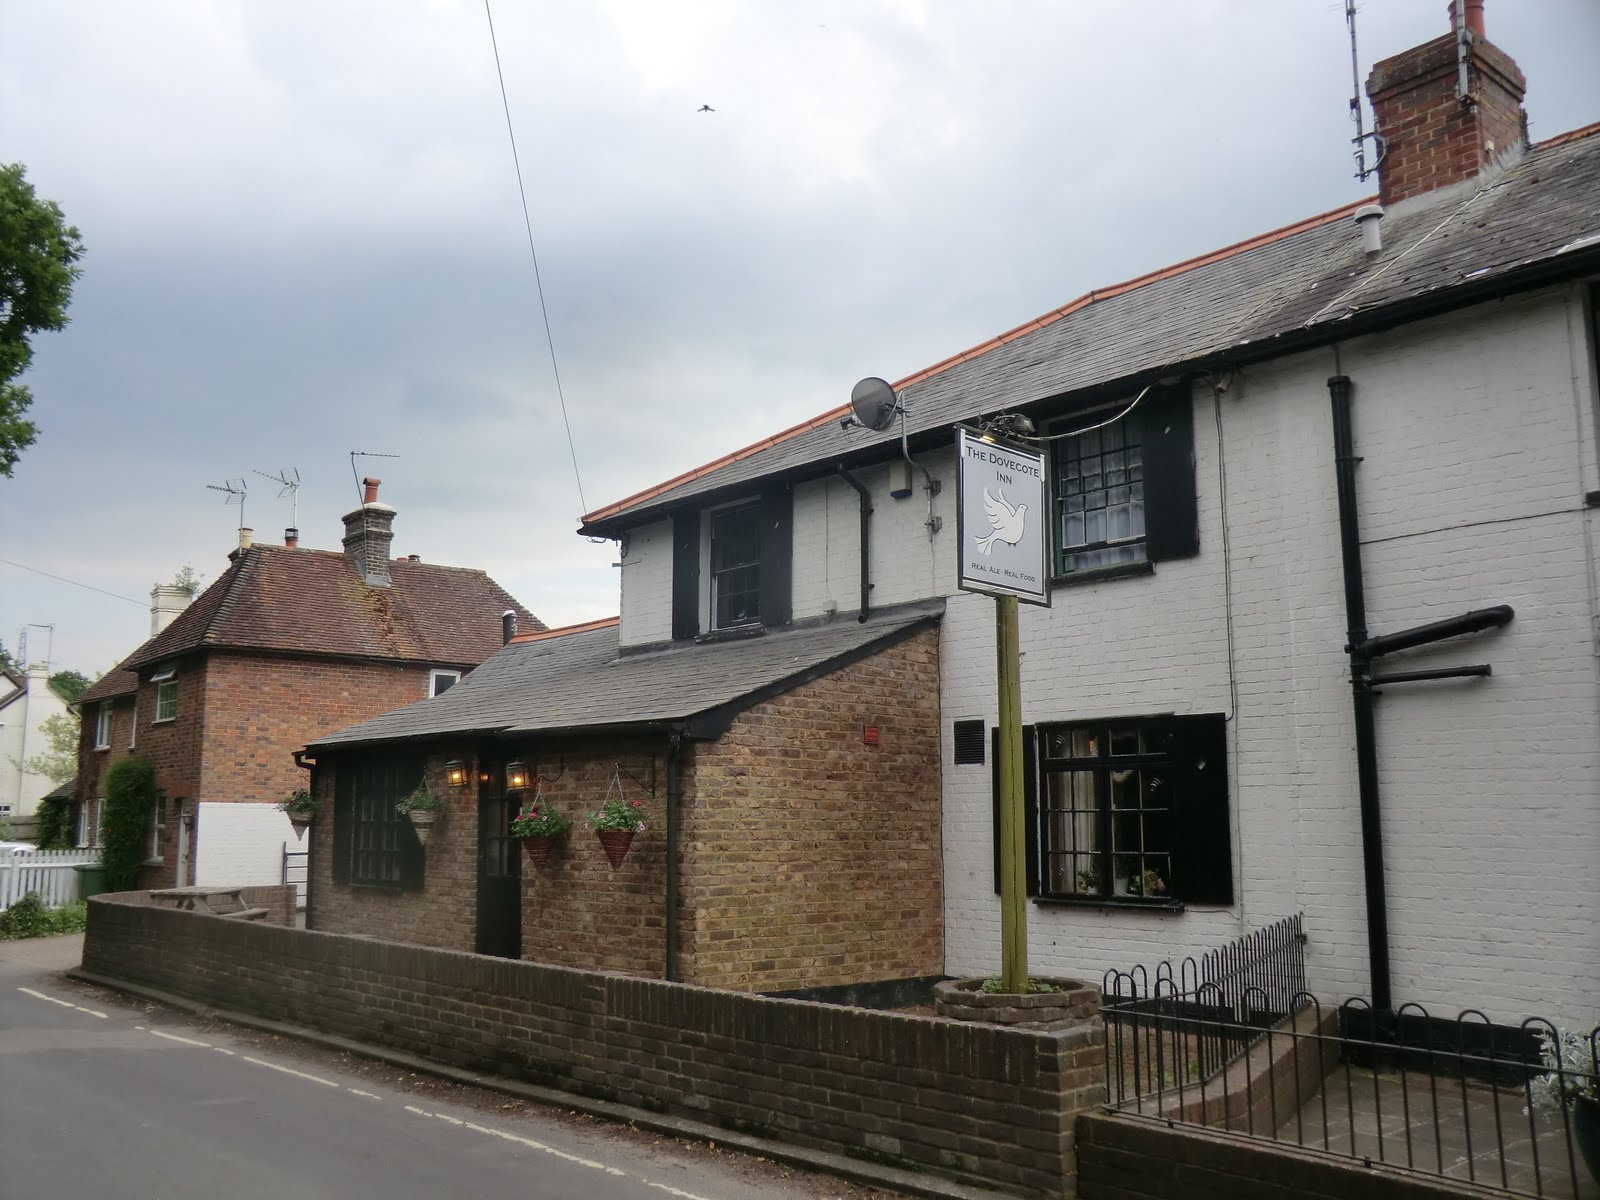 CIMG1918 The Dovecote Inn, Capel